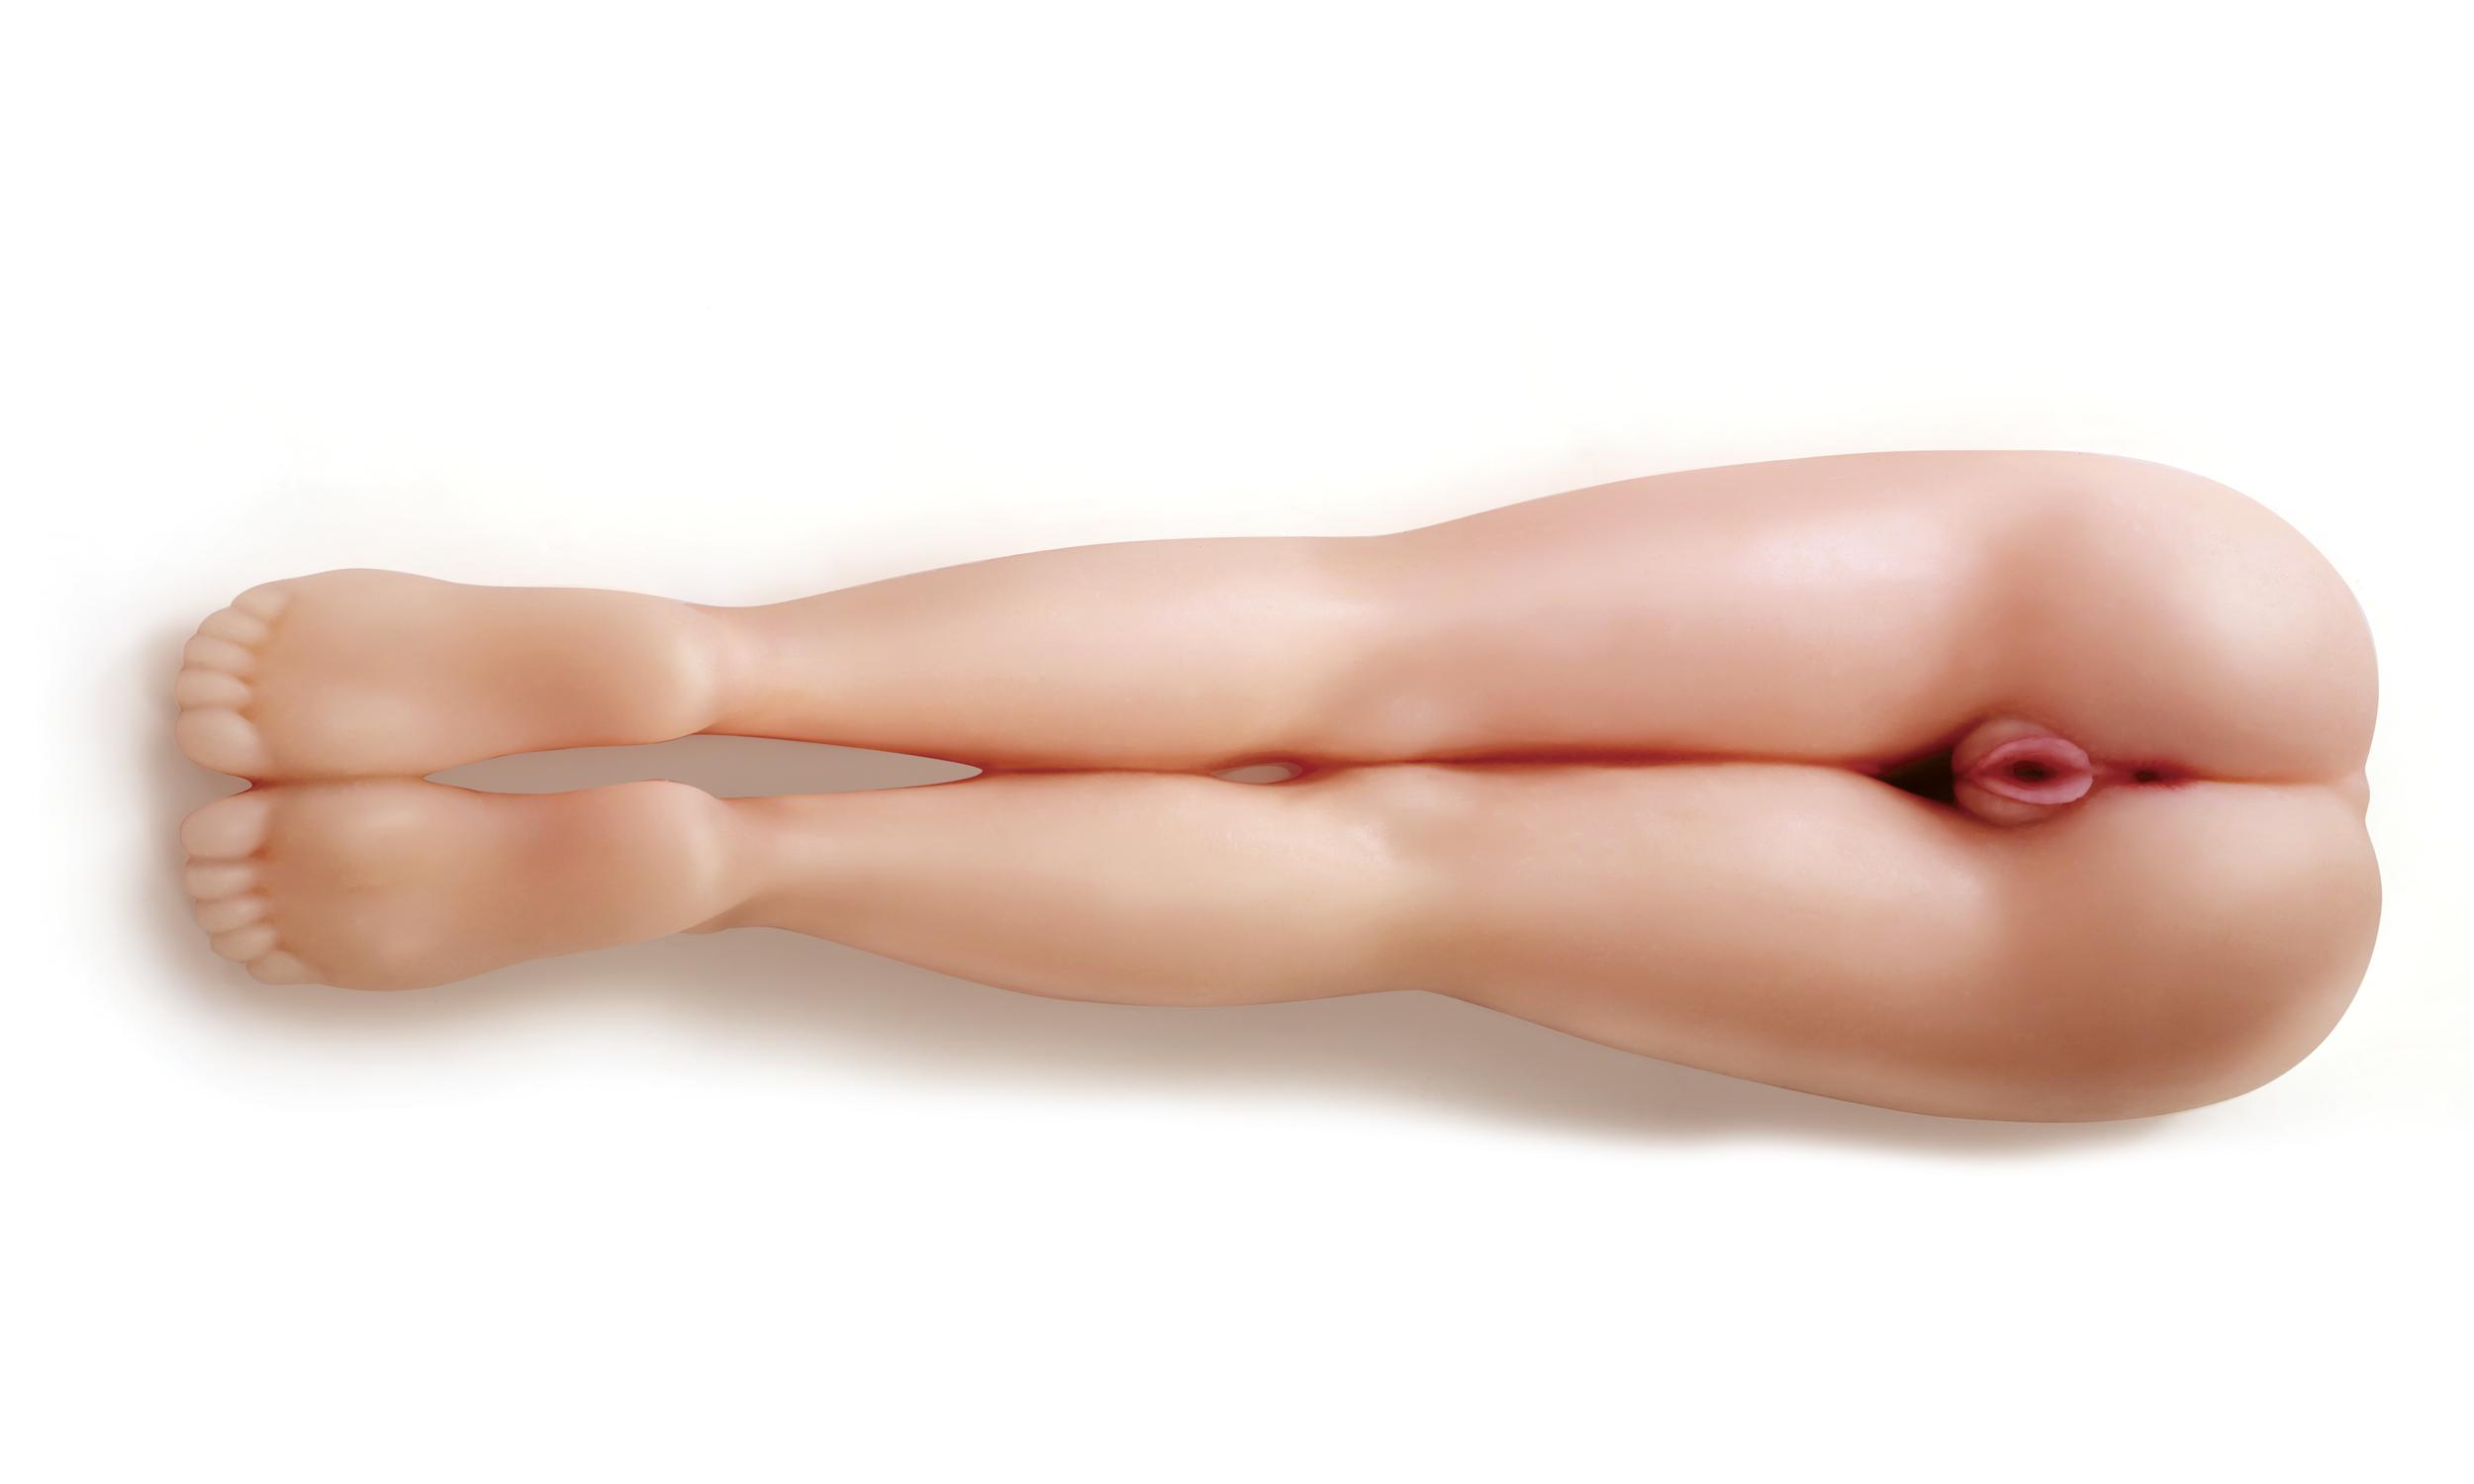 Ступни ног секс 2 фотография